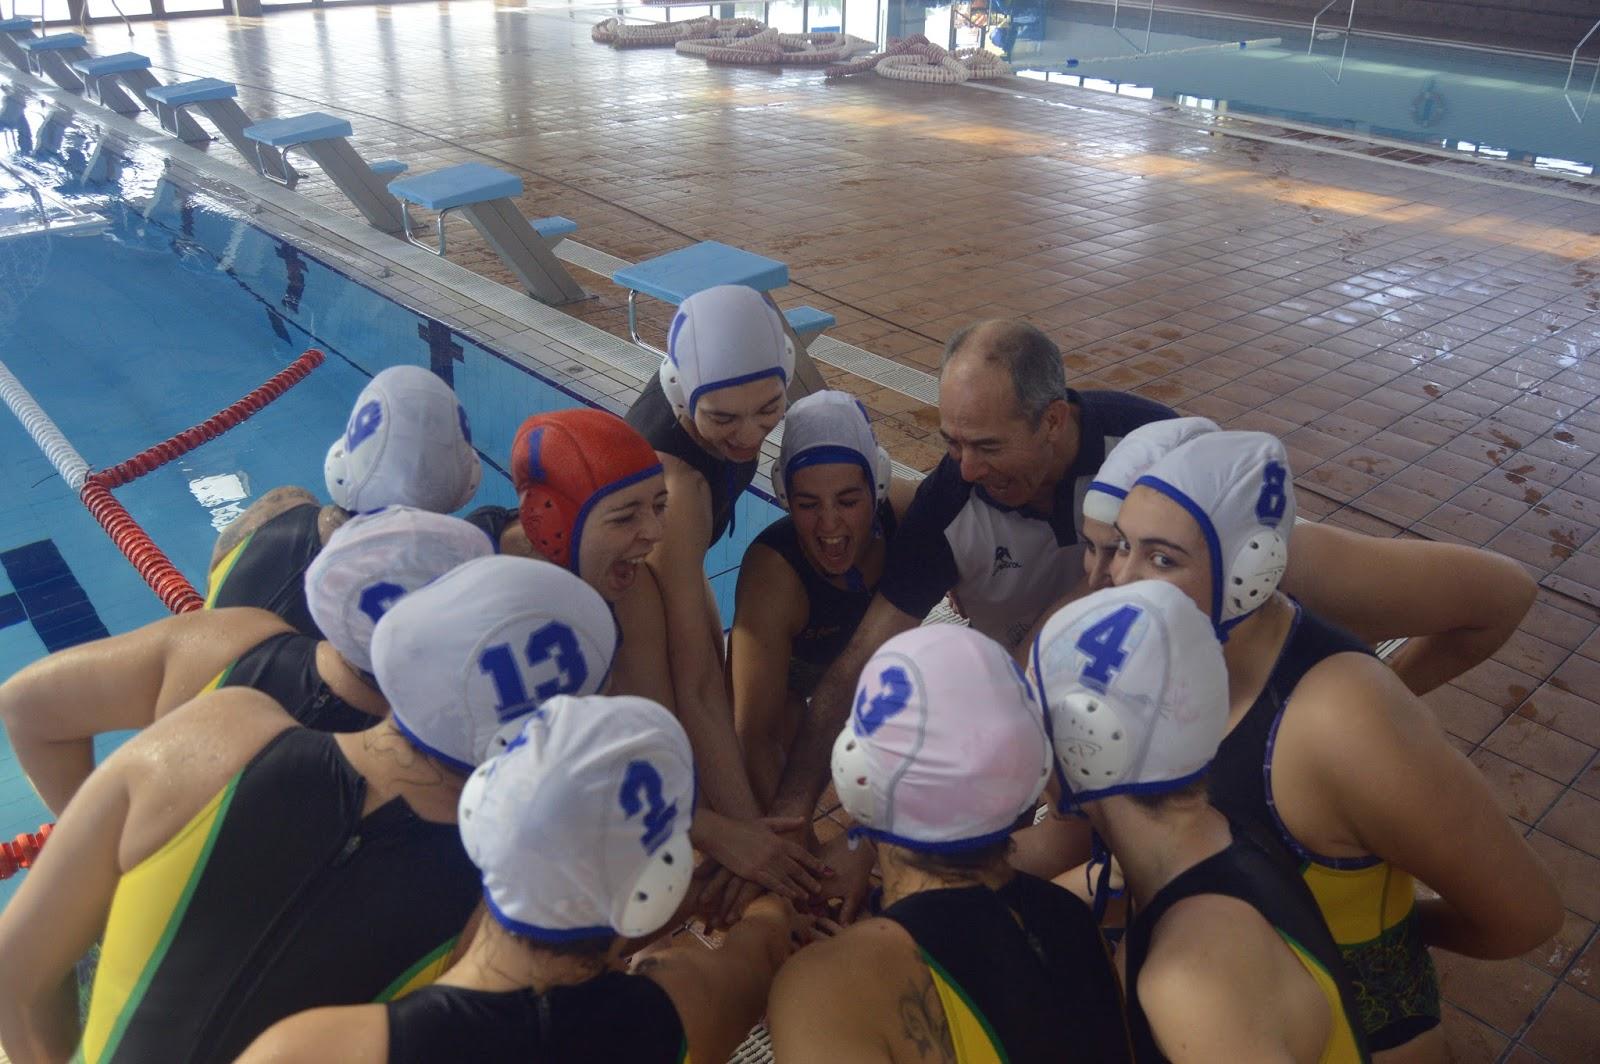 Club waterpolo castellae cr nica inicio liga eh 2017 2018 - Piscinas de portugalete ...